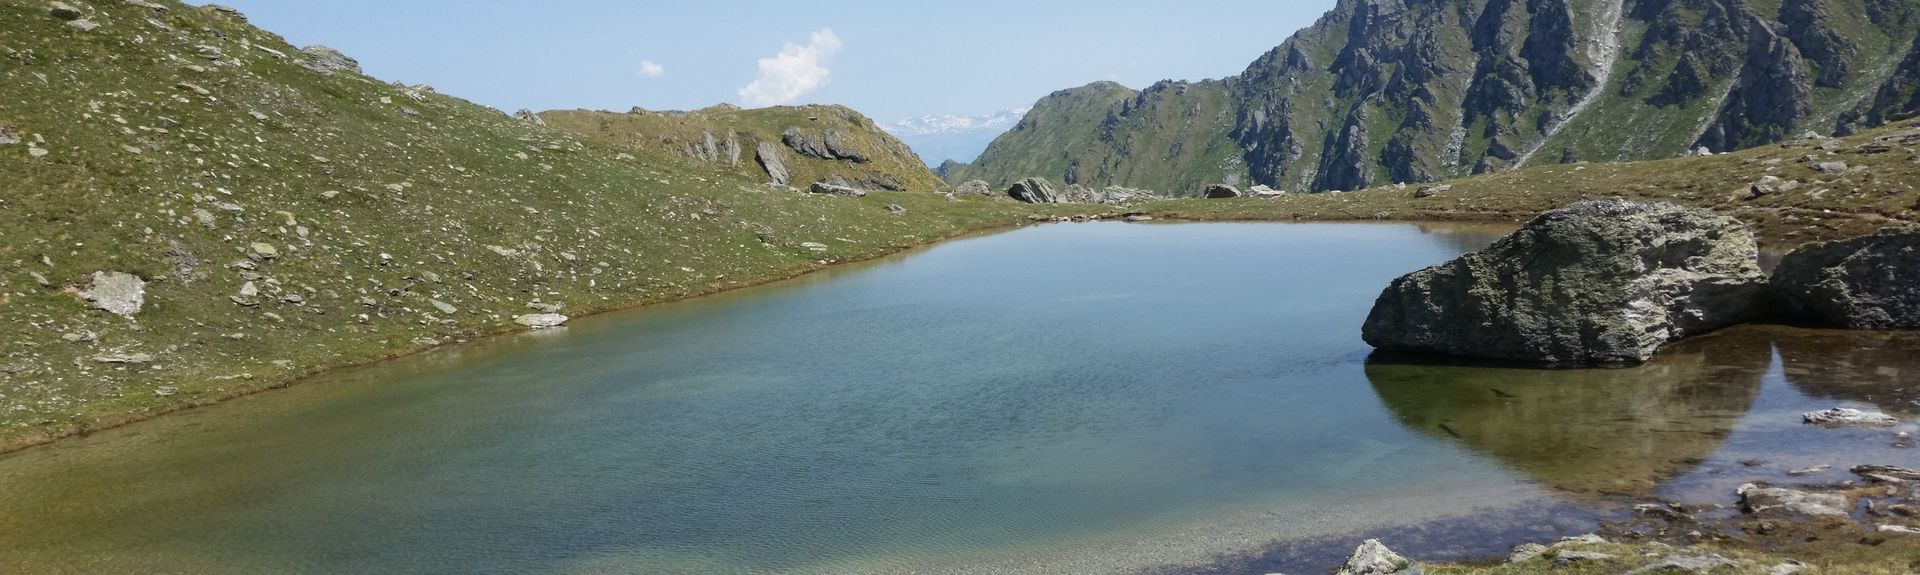 Funivia Zinal - Sorebois, Anniviers, Vallese, Svizzera